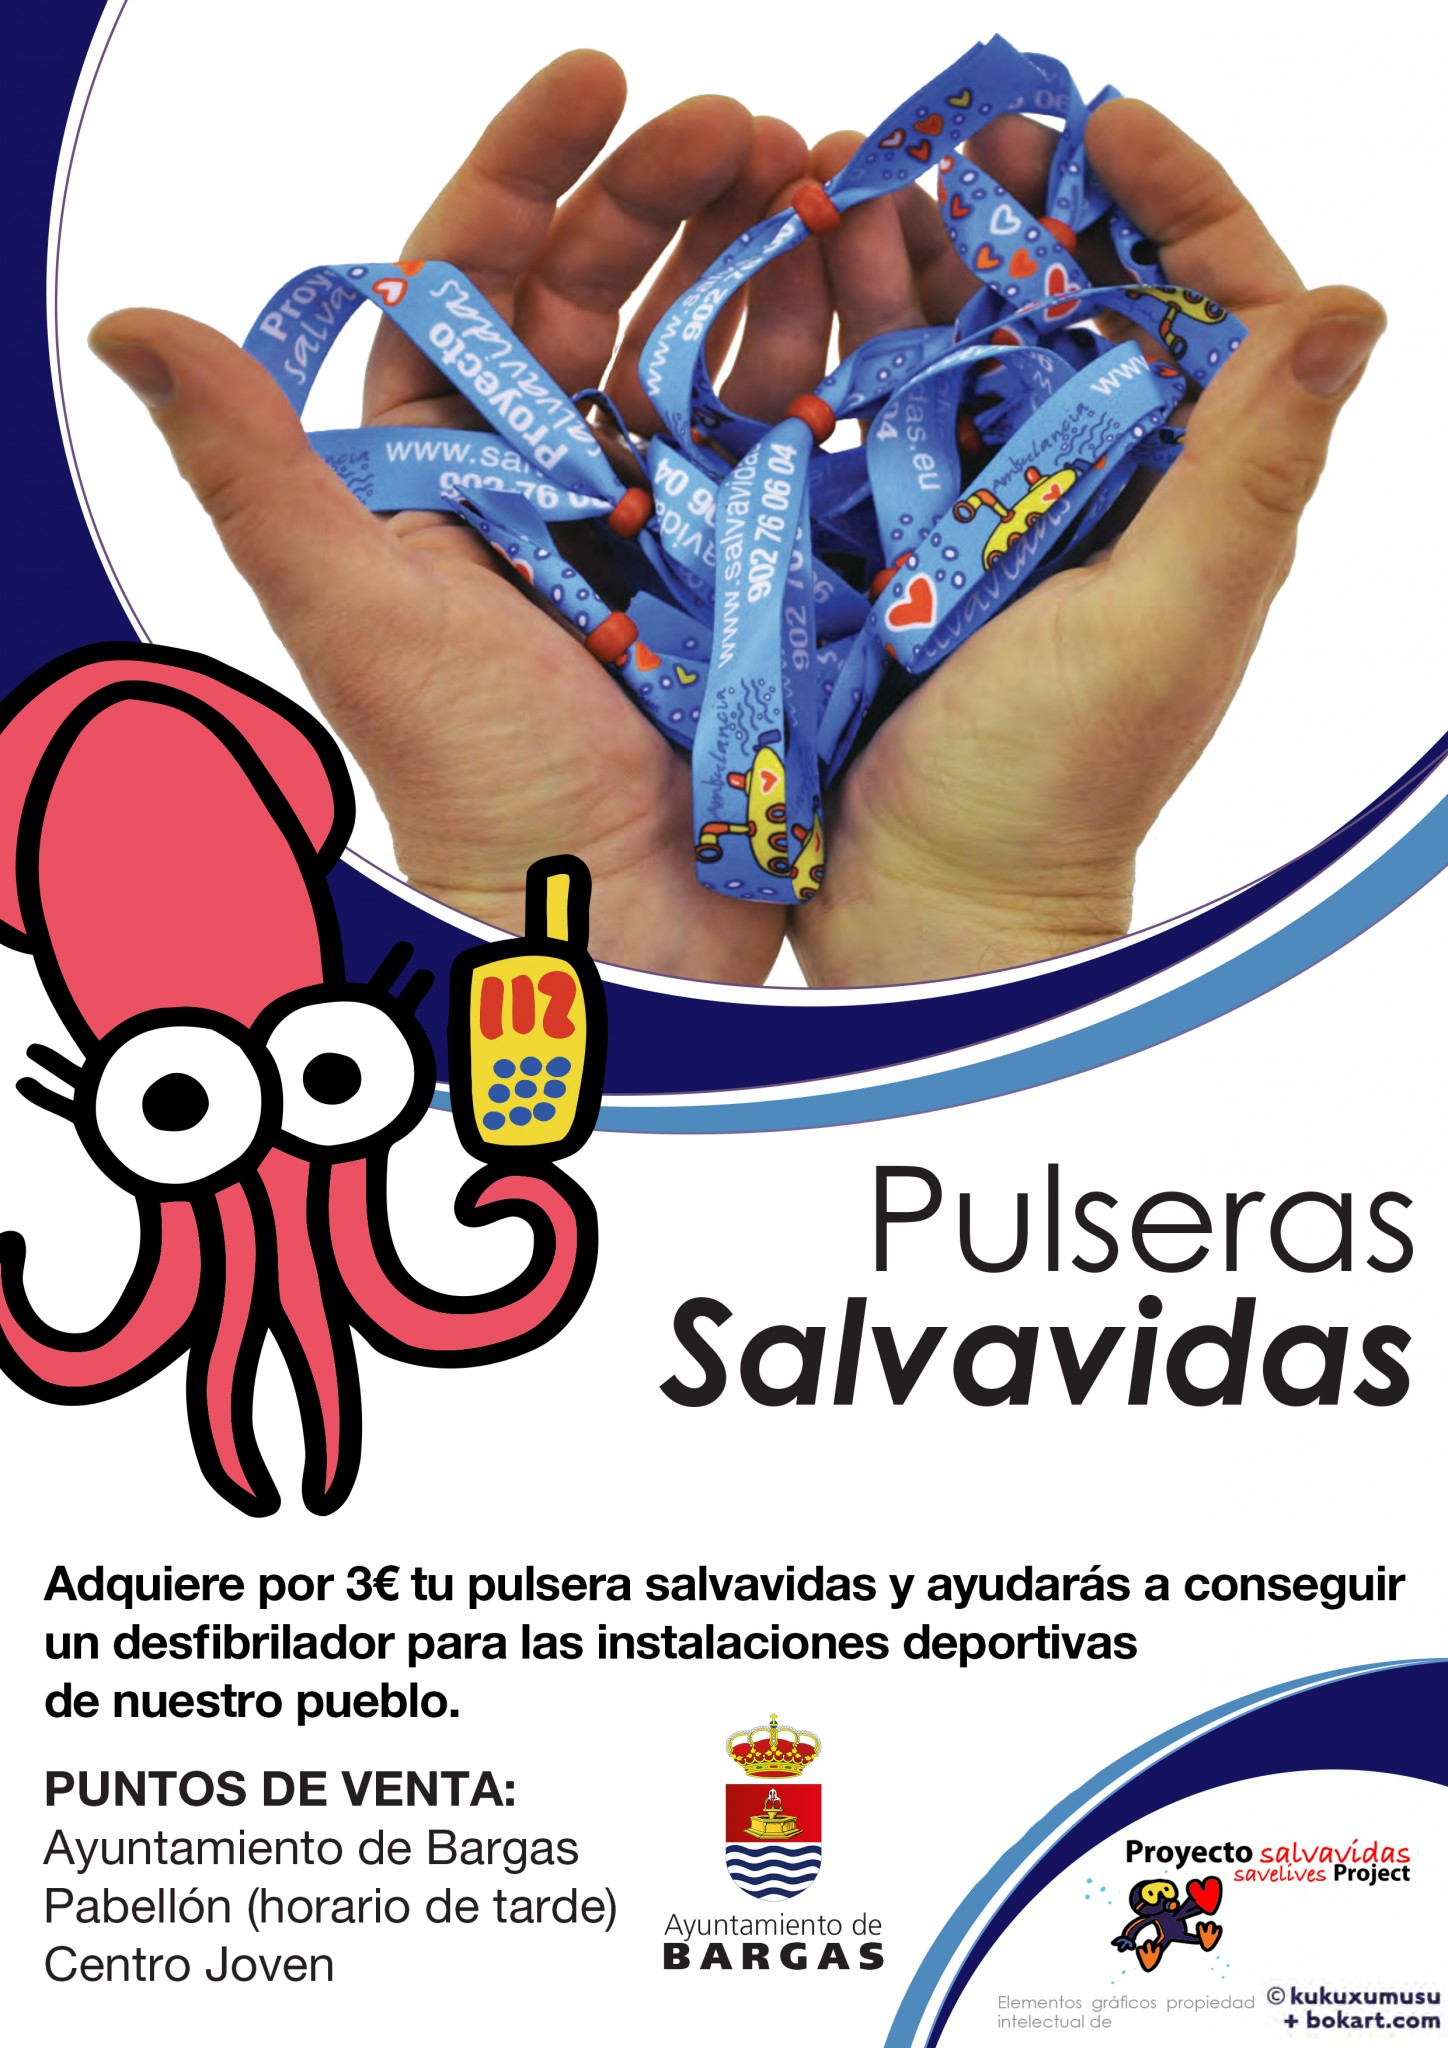 Pulseras Salvavidas